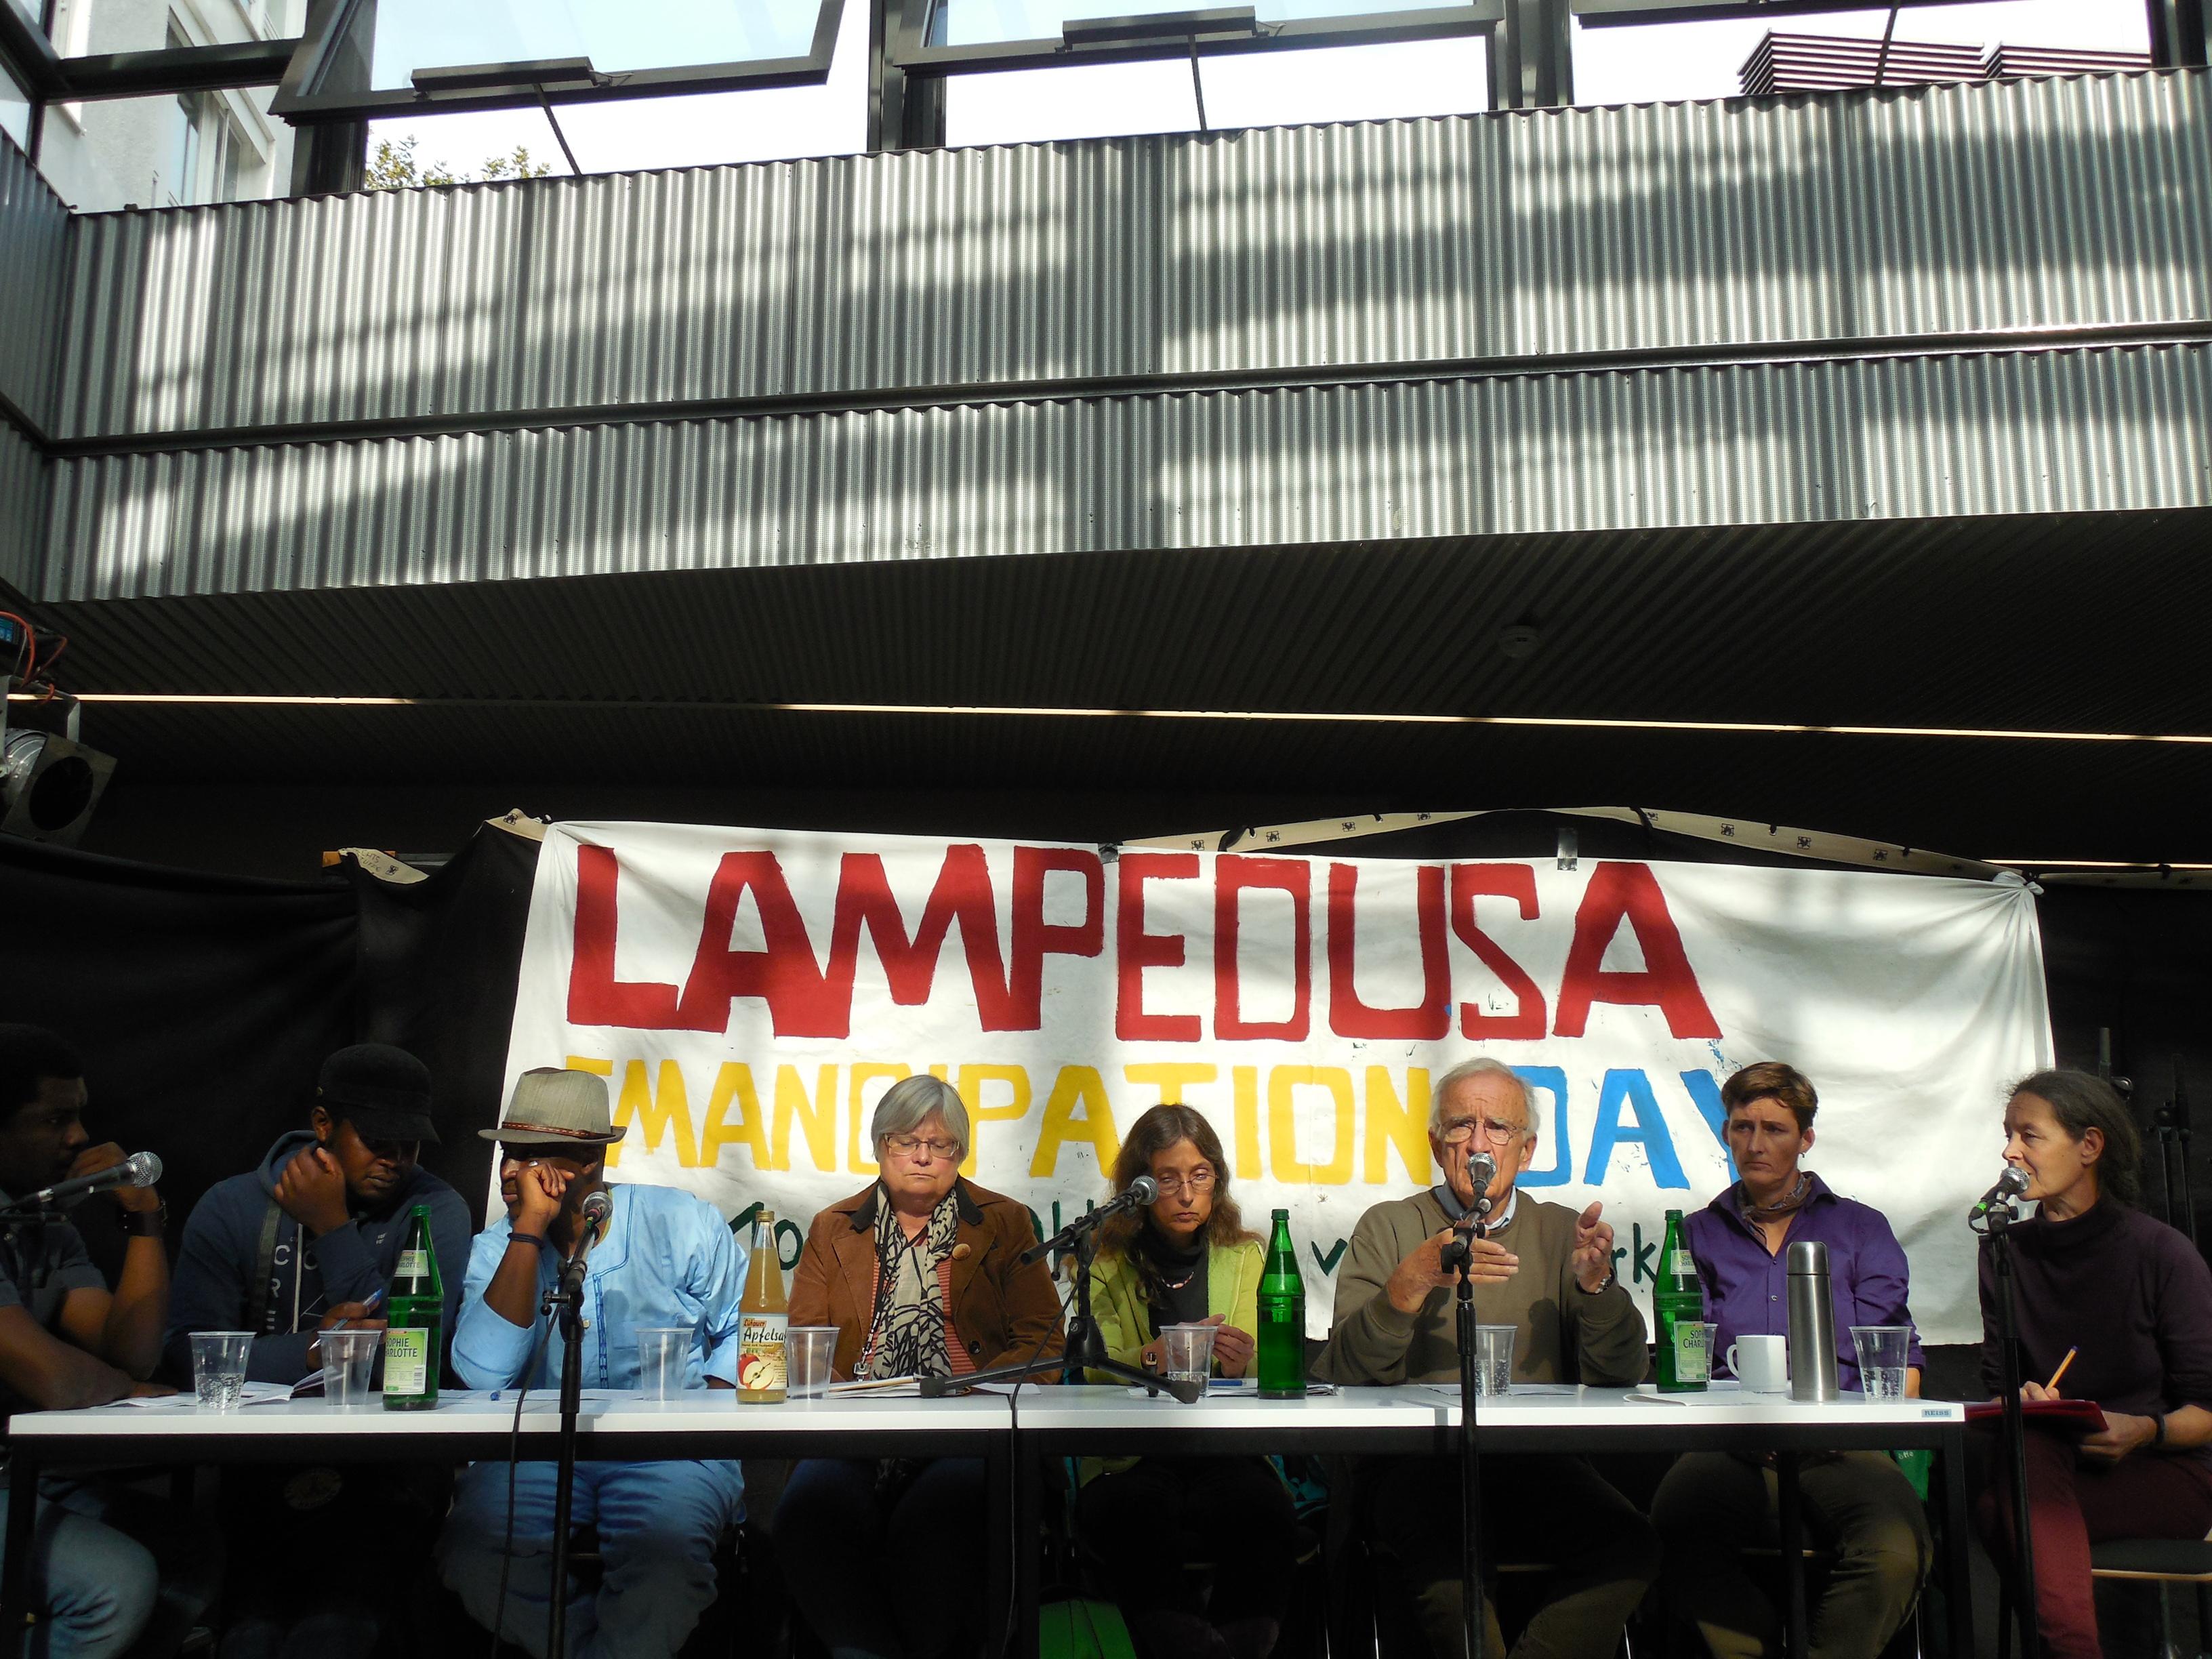 Lampedusa in Hamburg Diskussion Oktober 2014